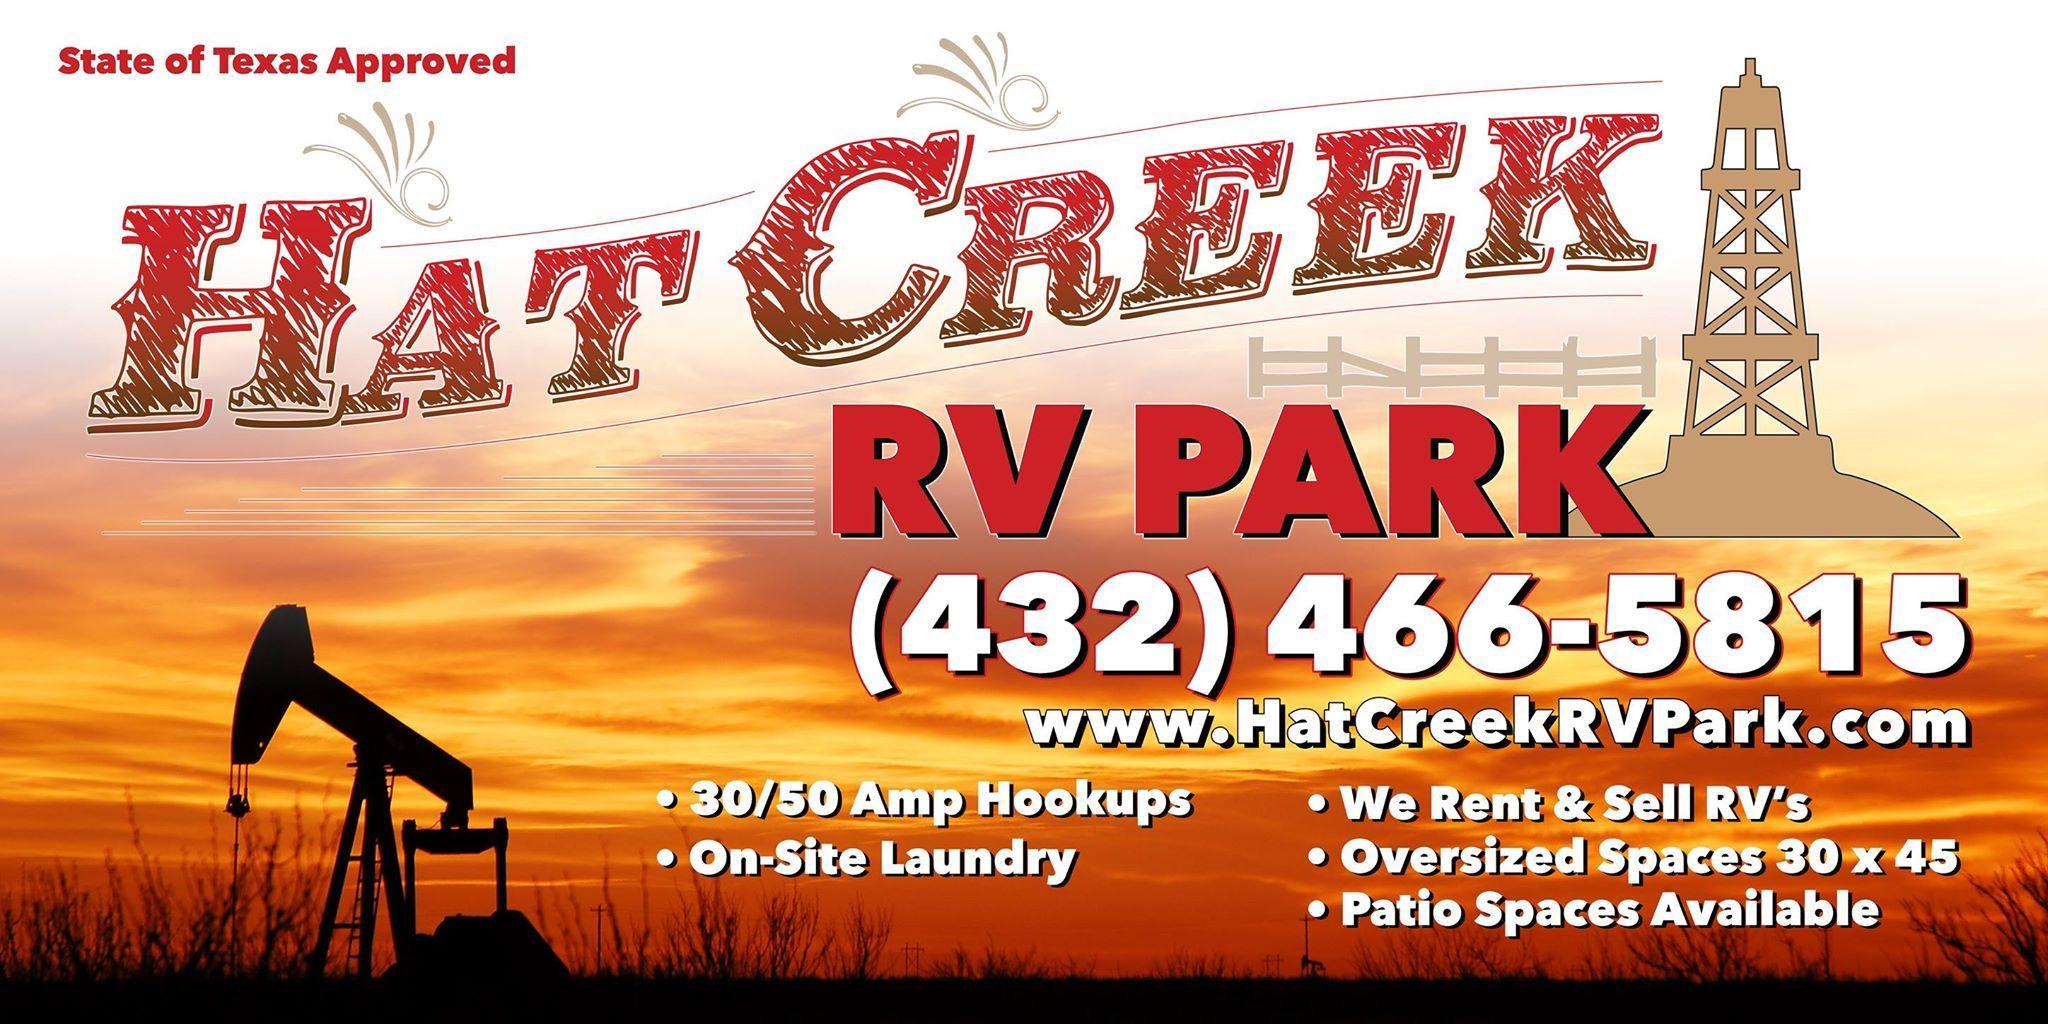 Pin By Hat Creek Rv Park On Hat Creek Rv Park Rv Parks Park Rv